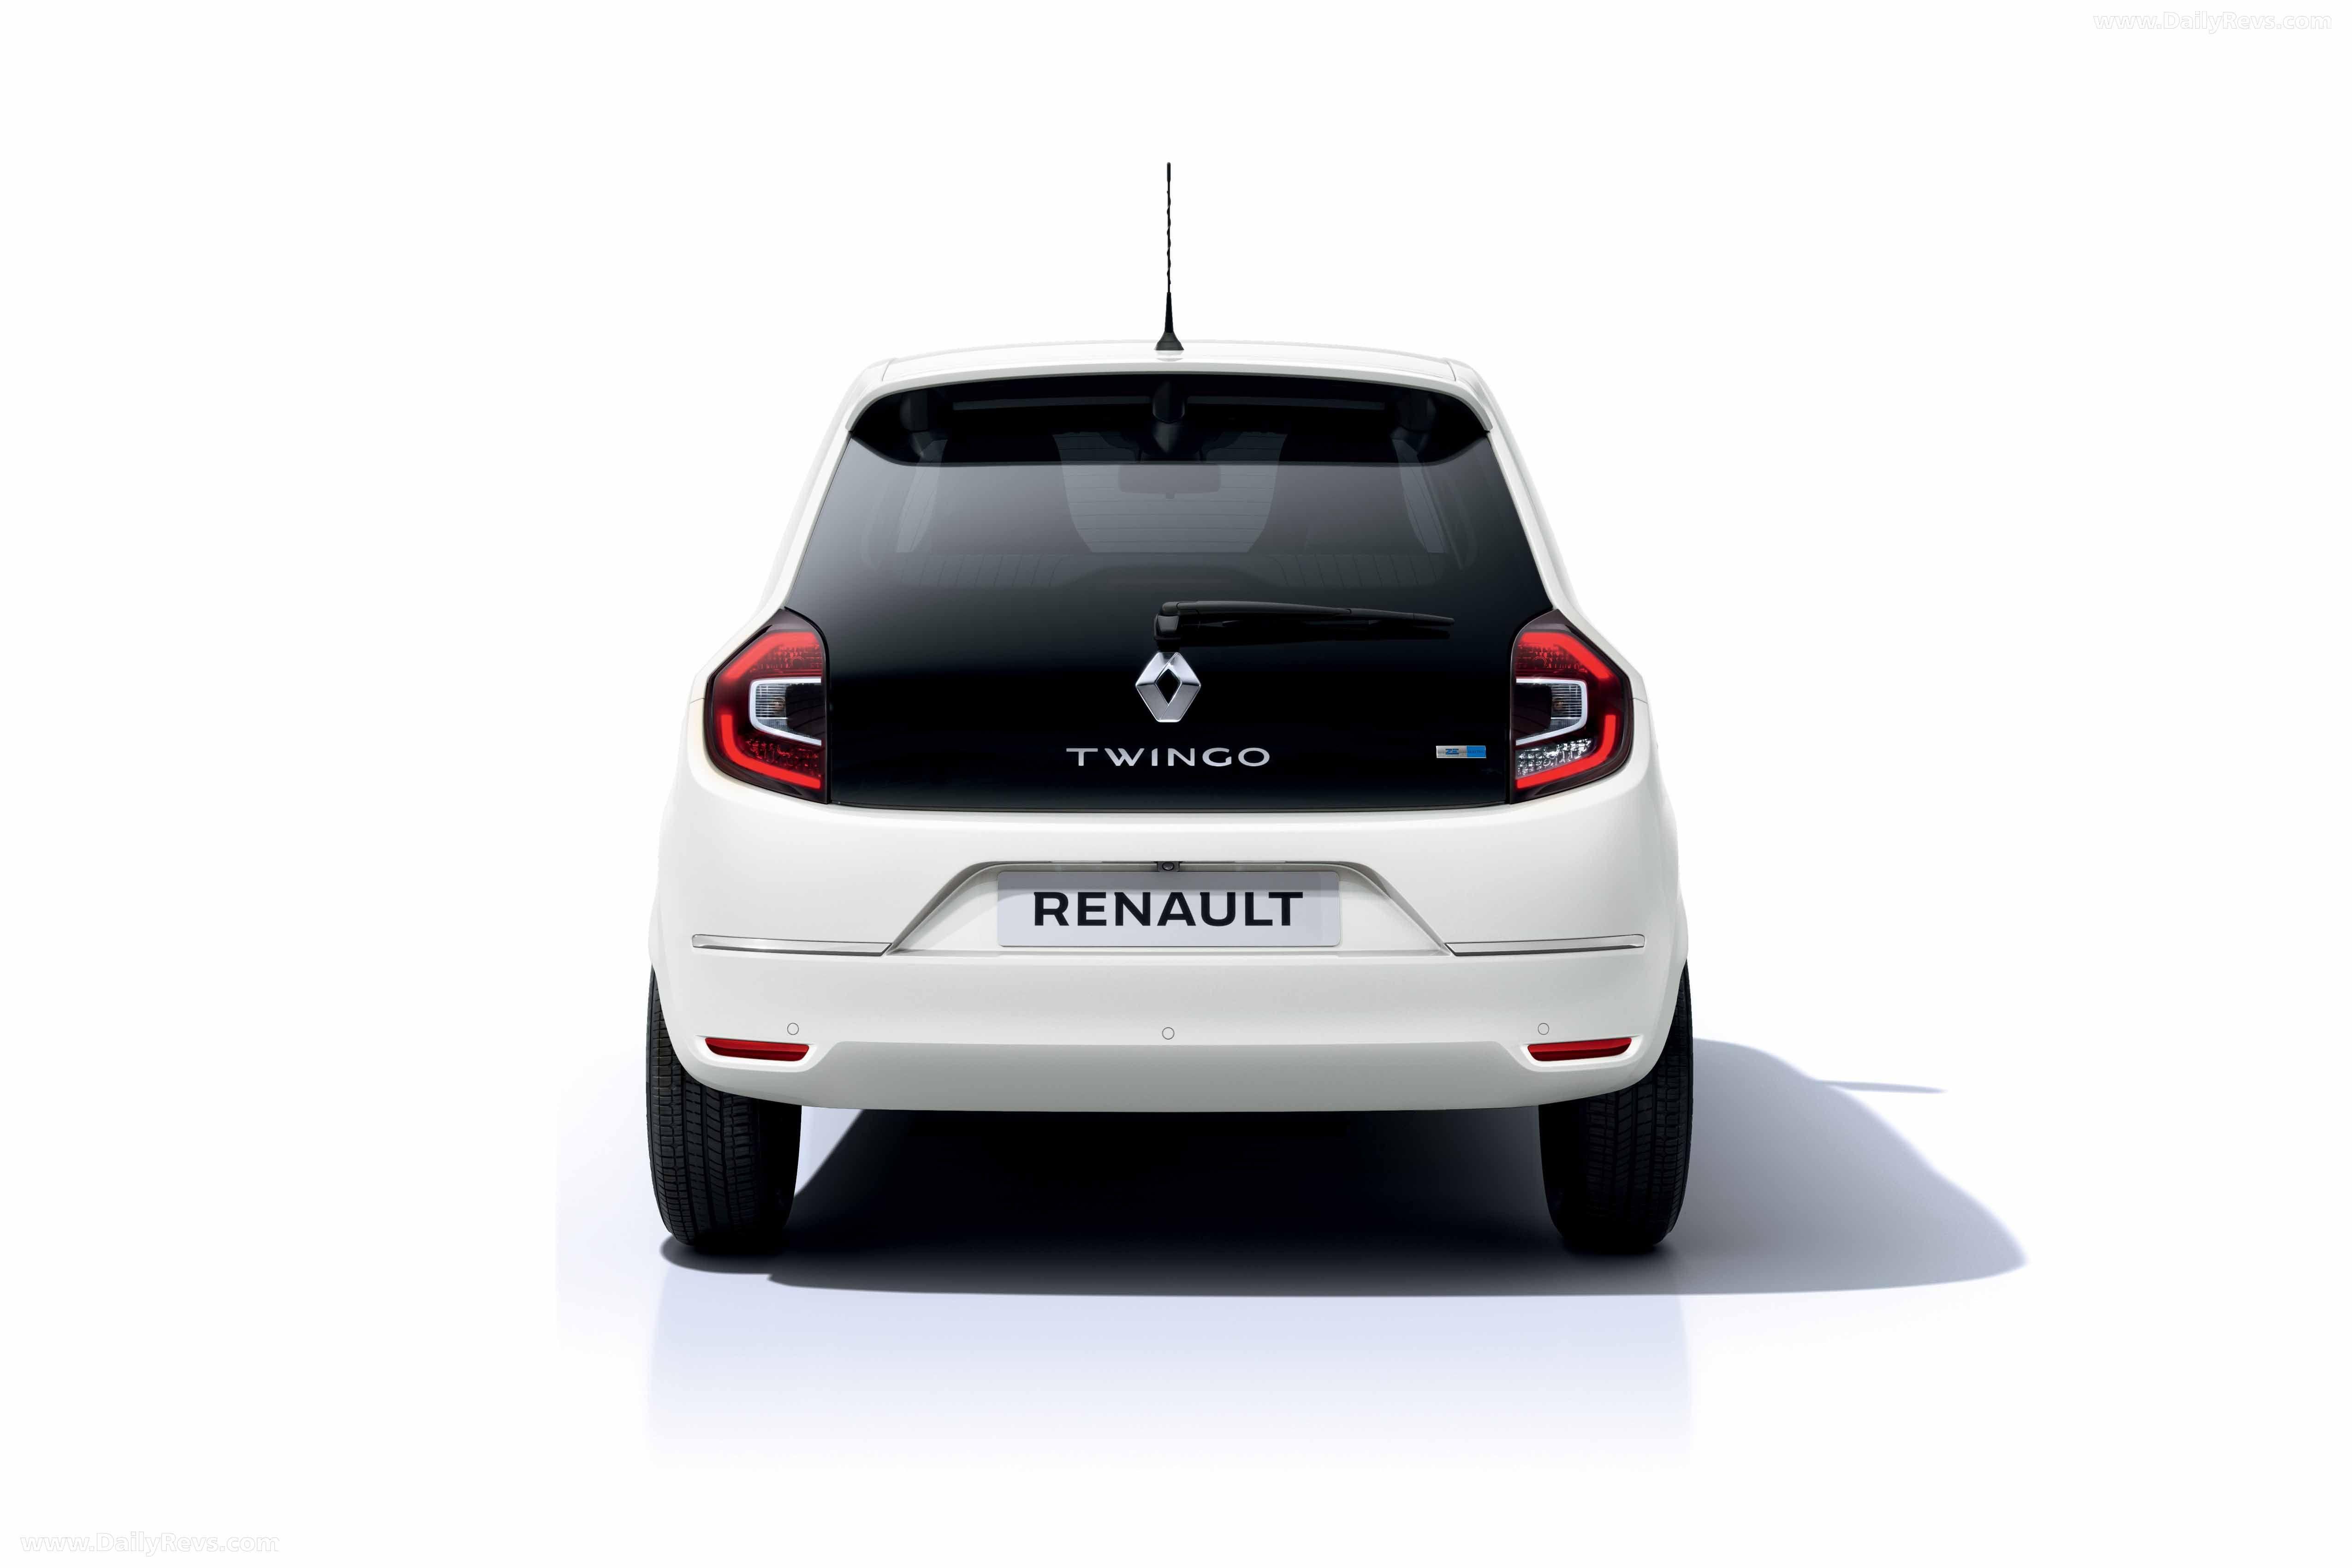 2020 Renault Twingo Z E Dailyrevs In 2020 Automobile Suv Car Car